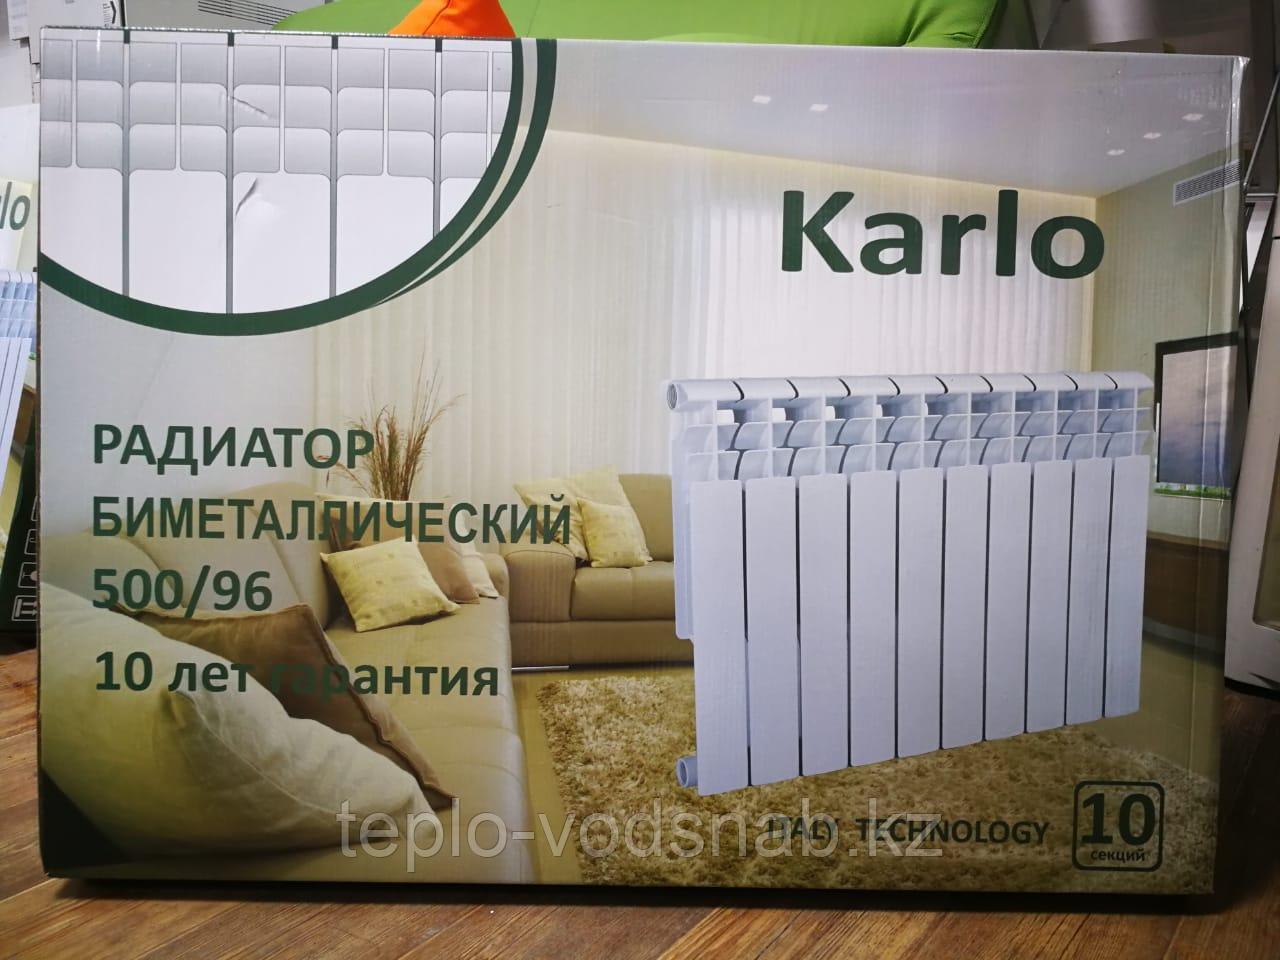 Радиатор биметаллический KARLO 500/96